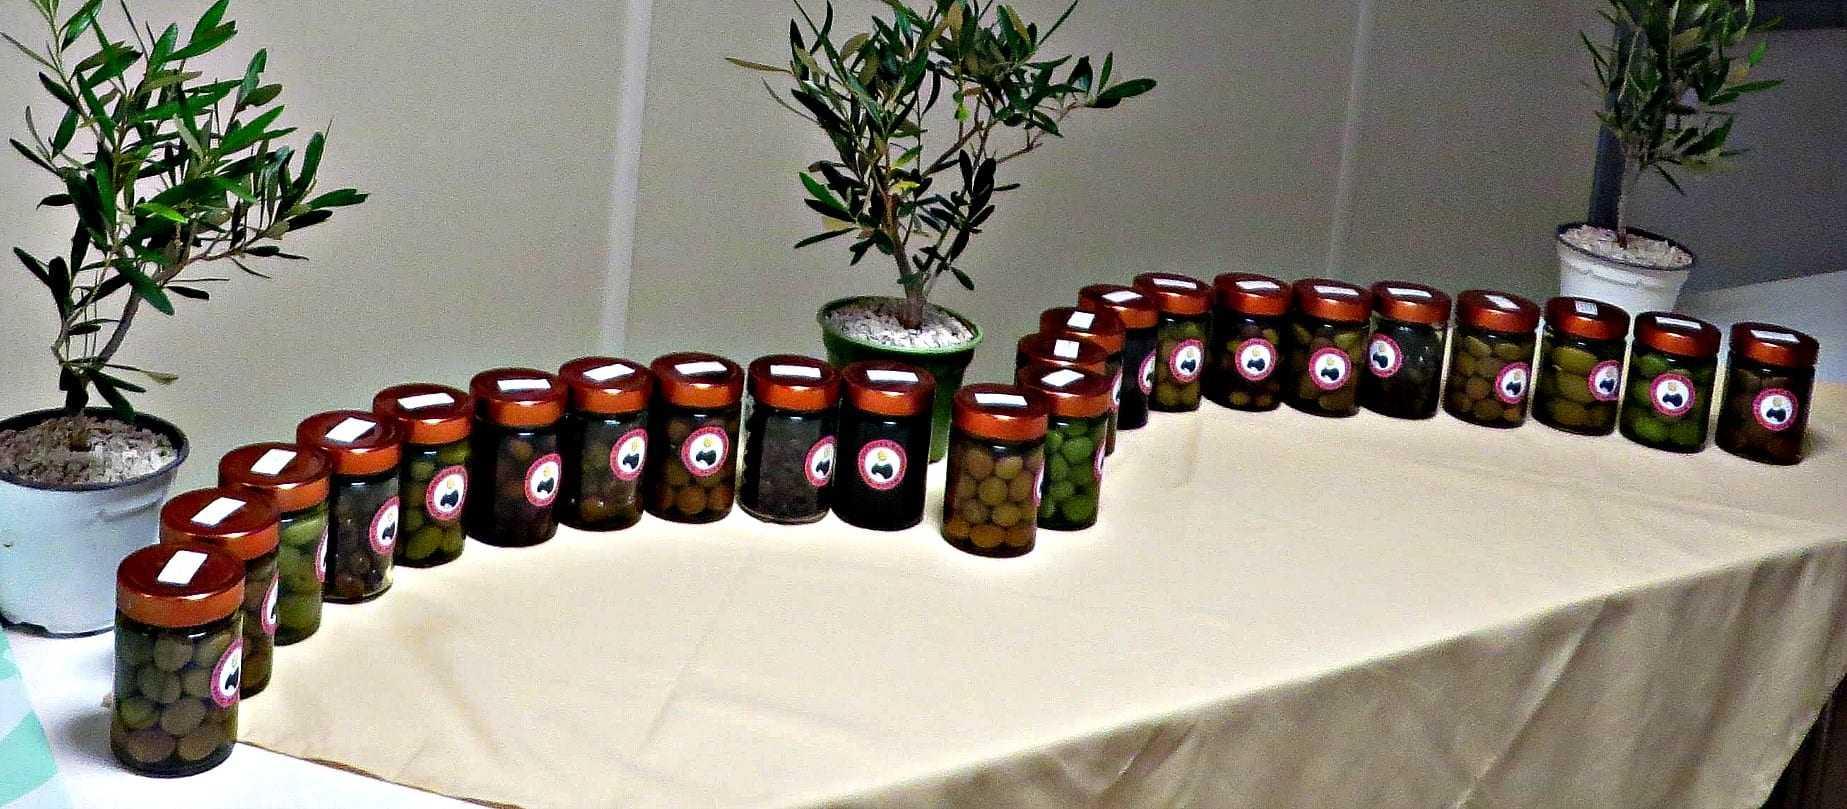 4th-monna-oliva-celebrates-best-italian-table-olives